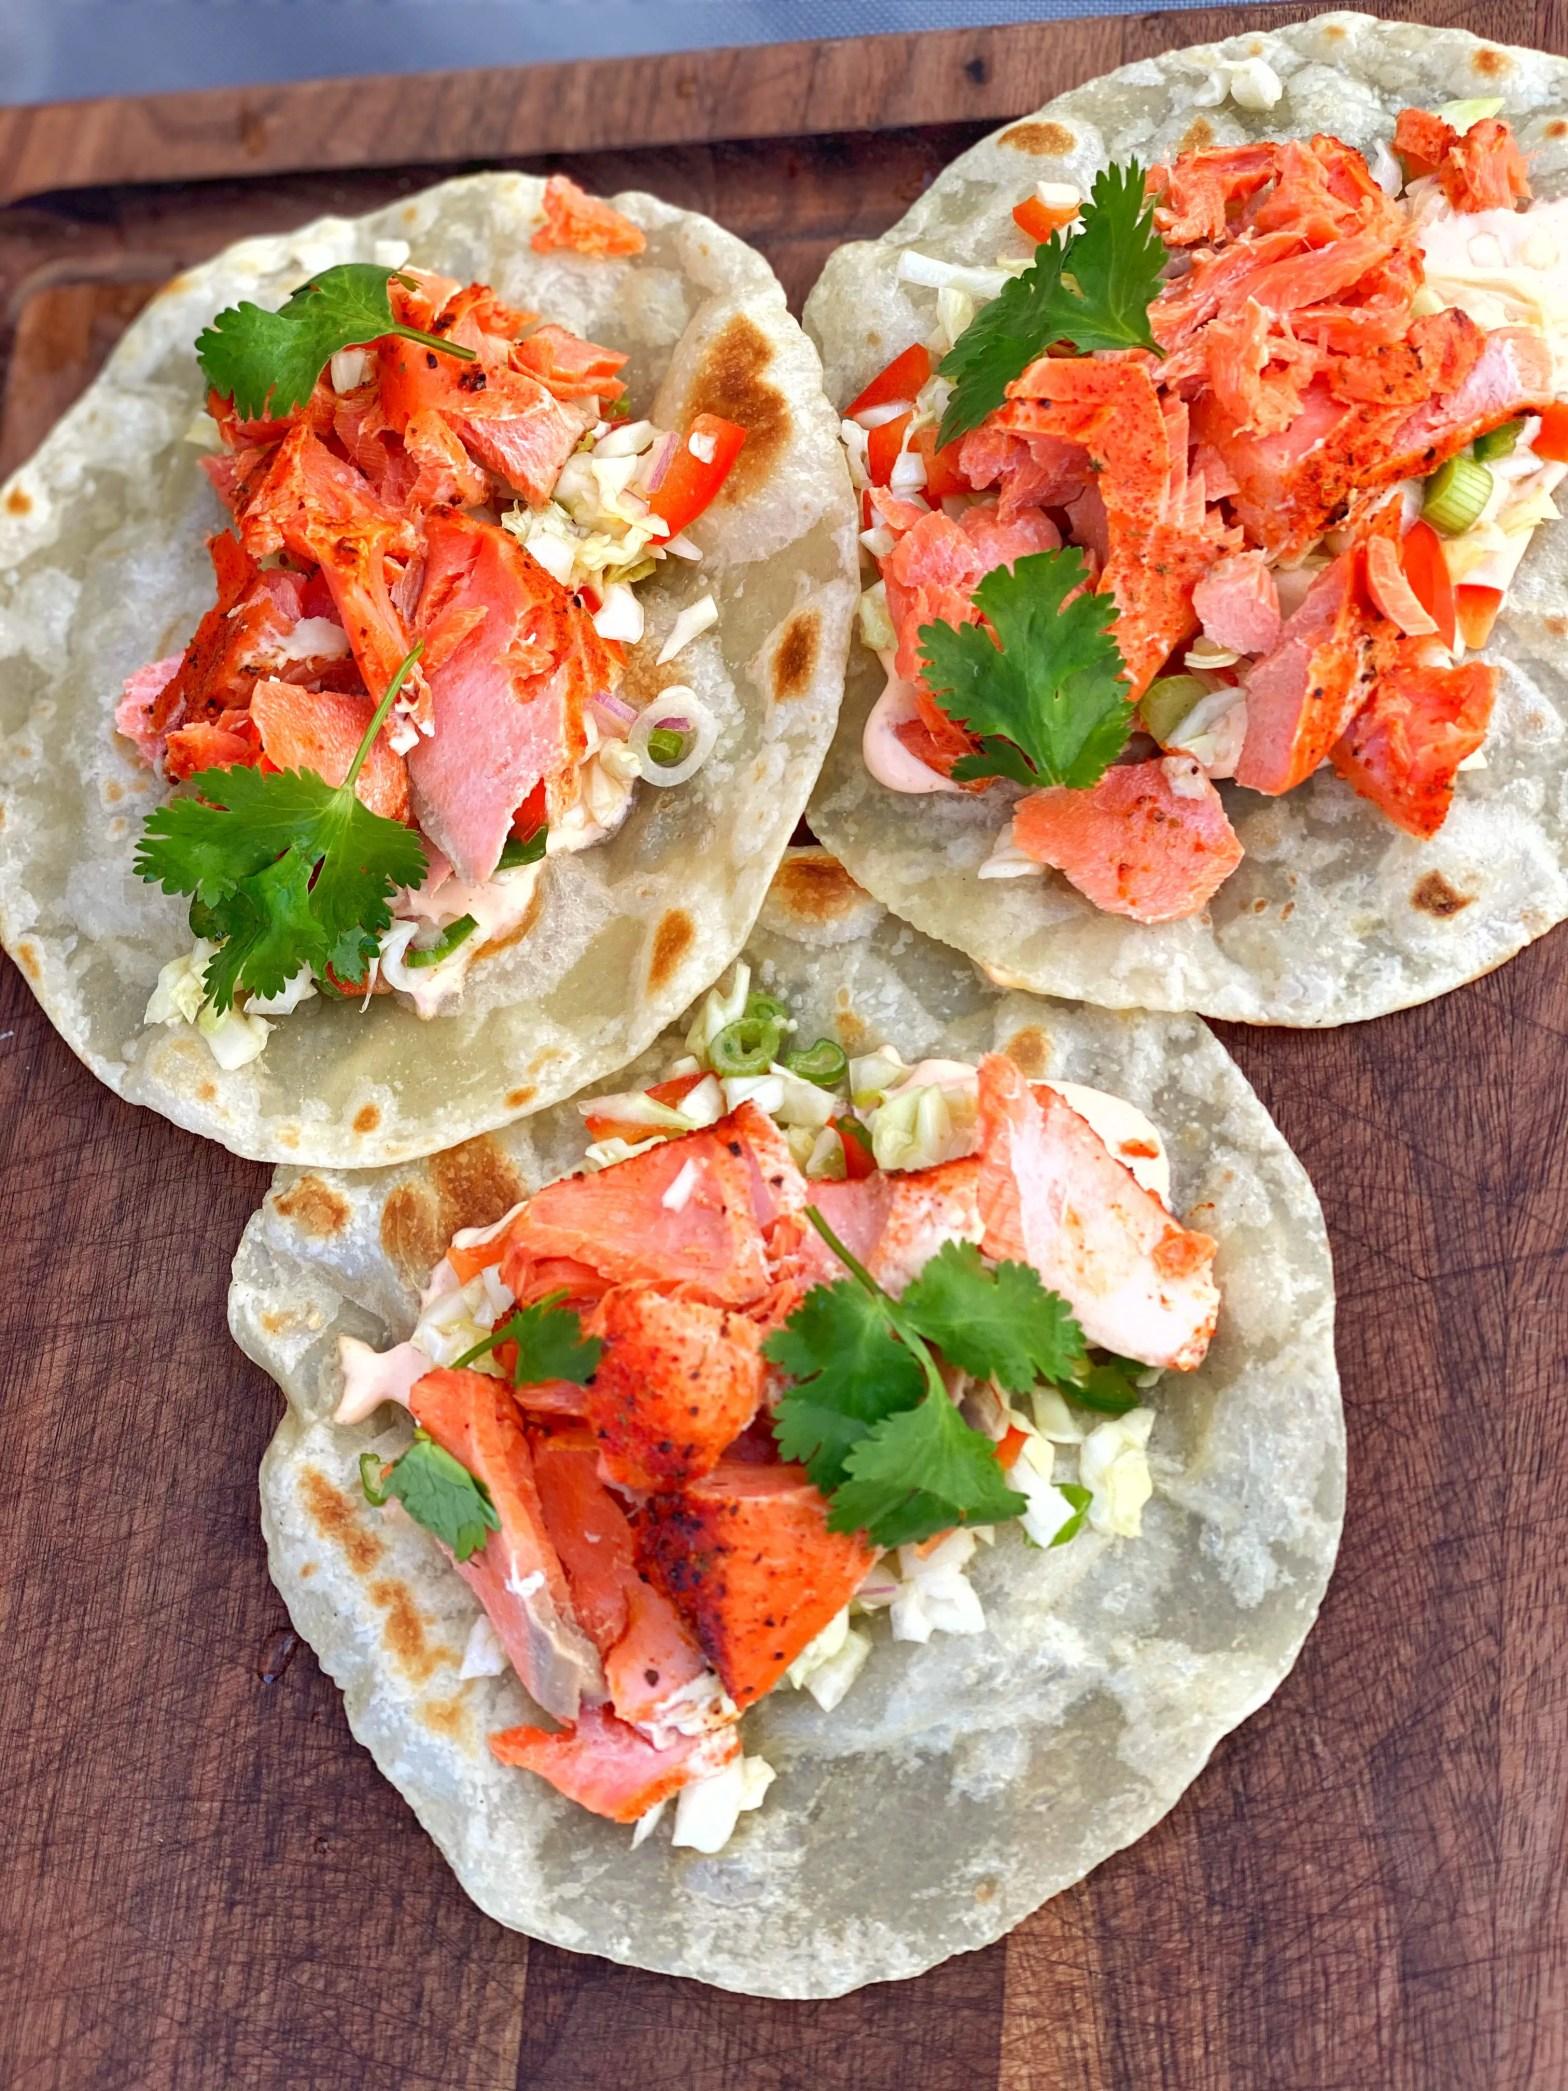 Salmon Tacos with Citrus Slaw and Sriracha Crema